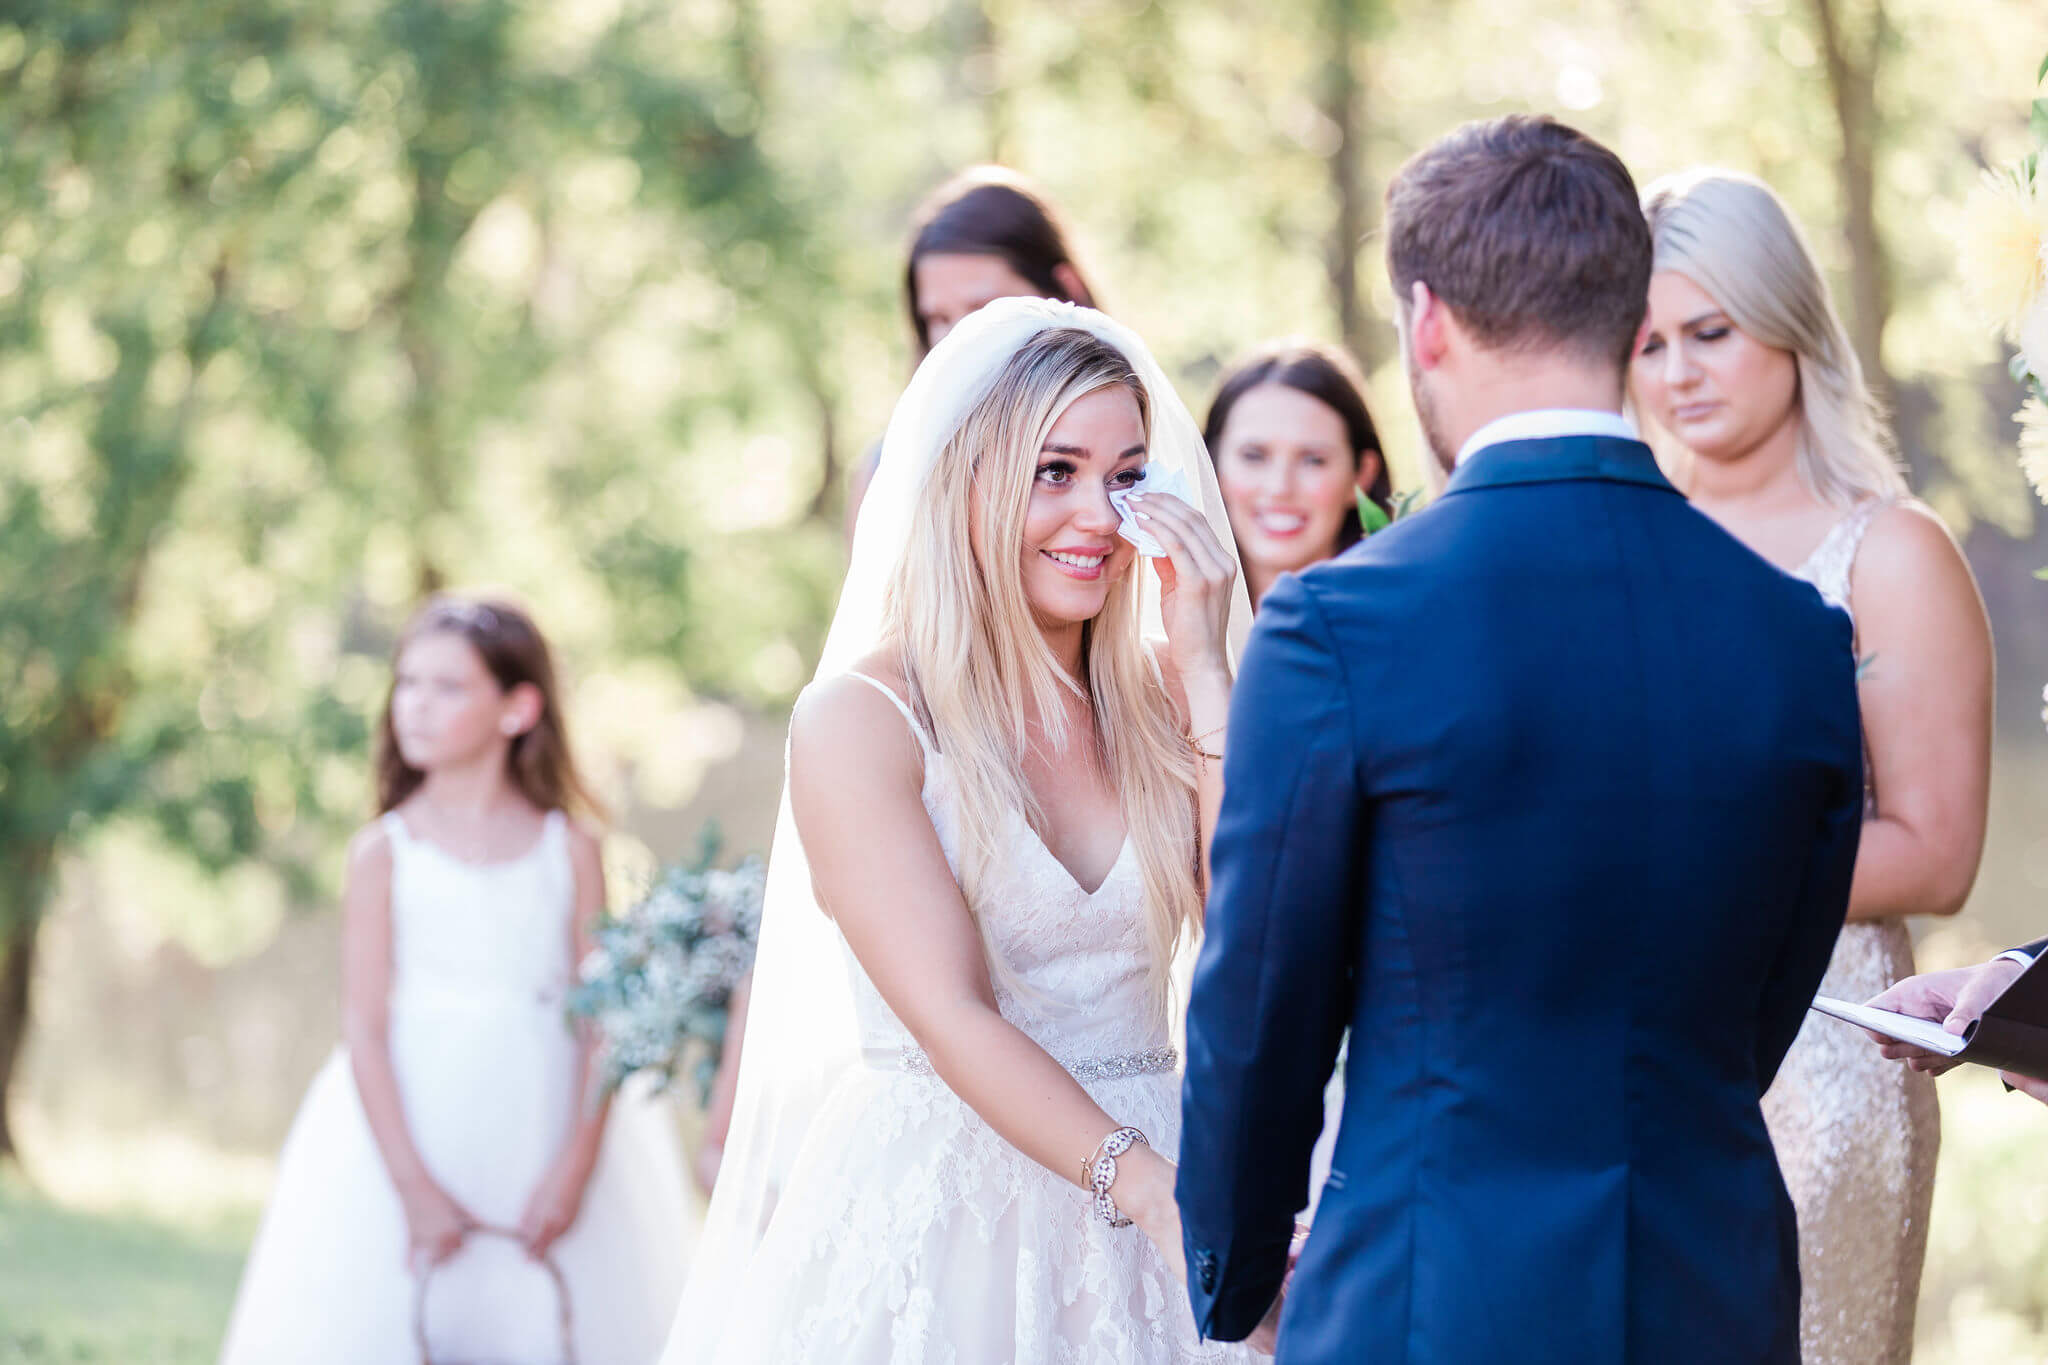 apt-b-photography-savannah-wedding-photographer-savannah-wedding-charleston-wedding-photographer-38.jpg